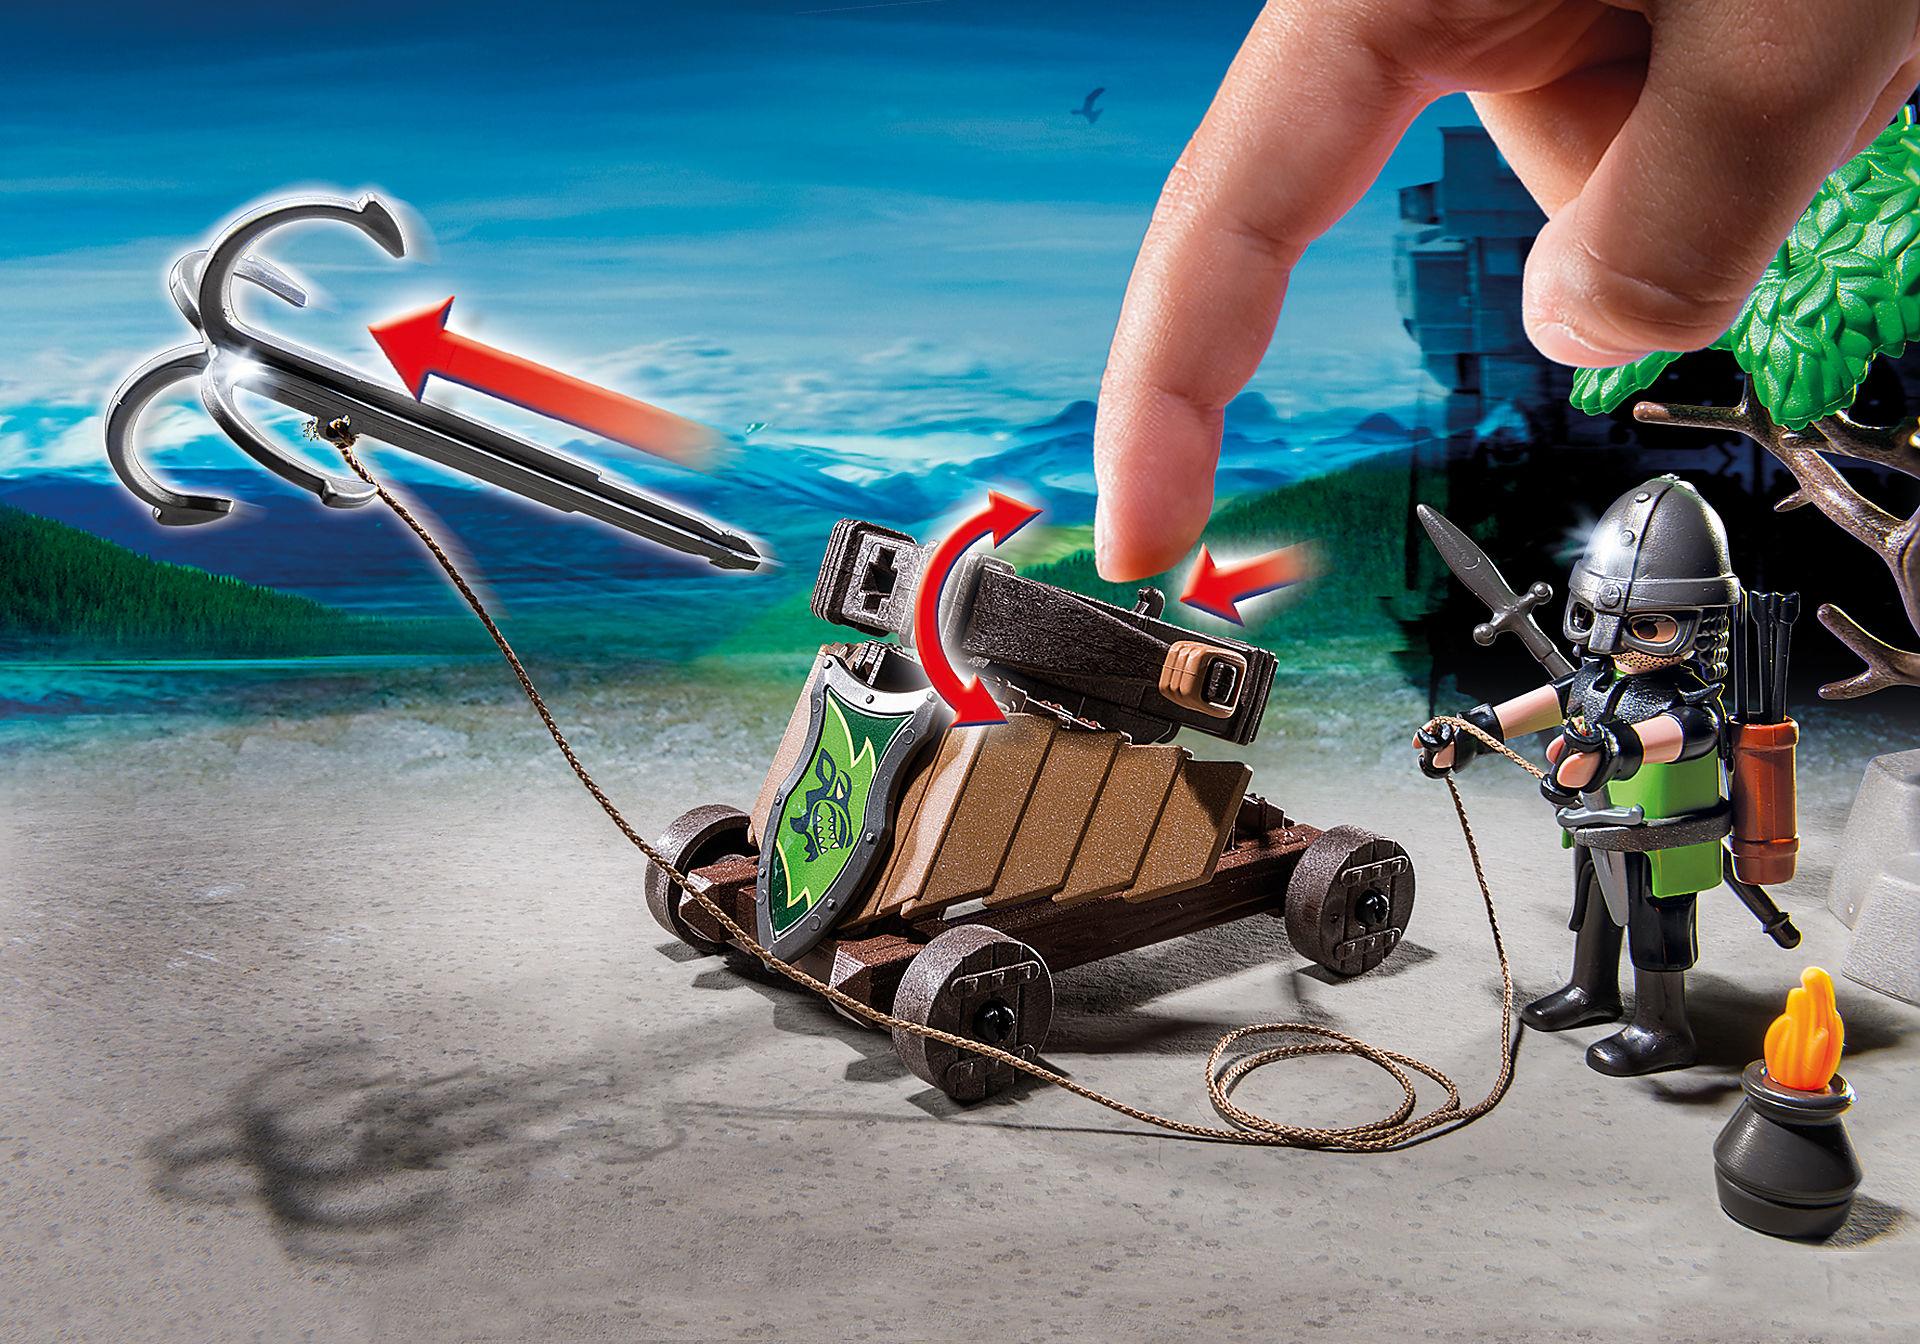 http://media.playmobil.com/i/playmobil/6041_product_extra2/Ιππότες του Λύκου με καταπέλτη